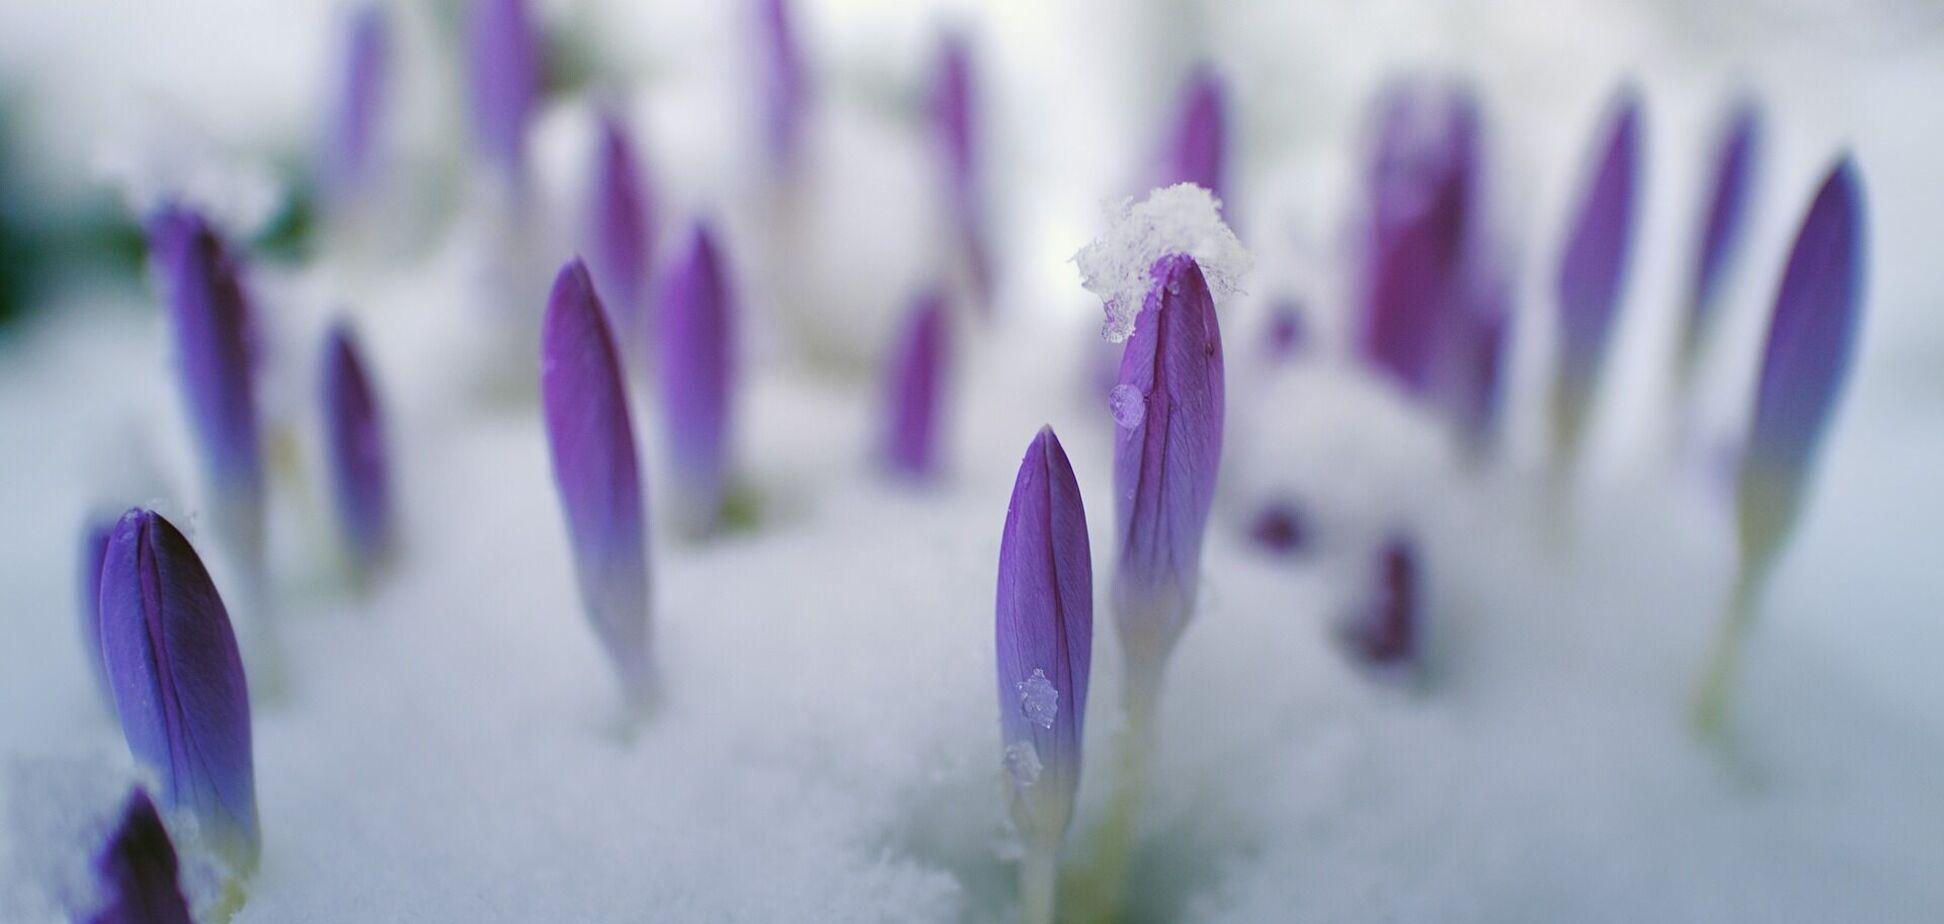 3 апреля: праздники, приметы на Кирилла Катаника и именинники